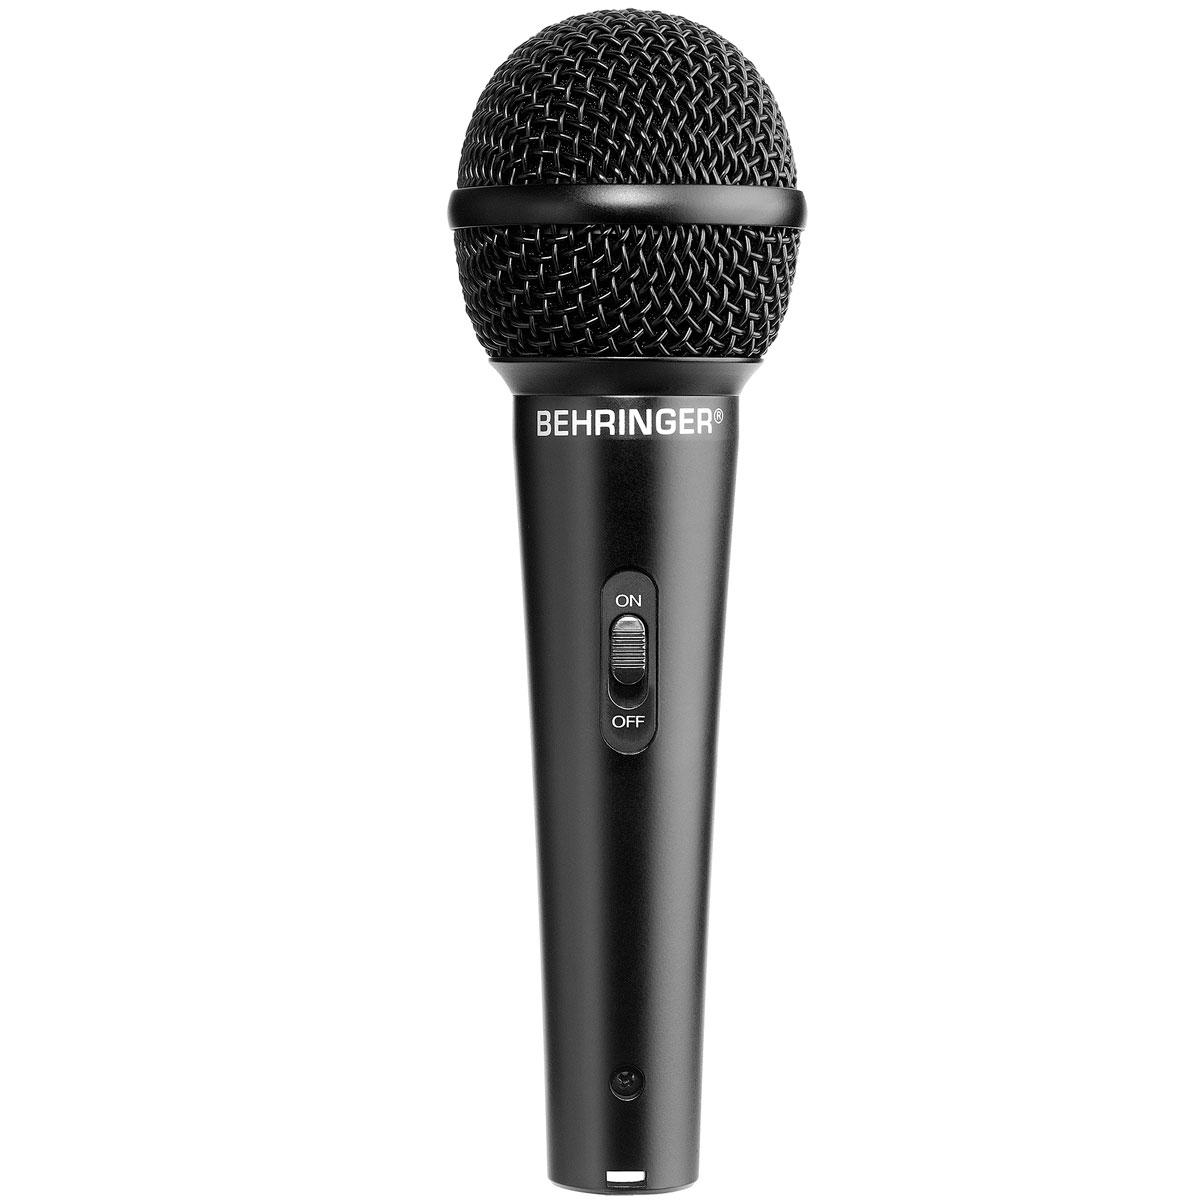 XM1800S - Kit 3 Microfones c/ Fio de Mão XM 1800 S - Behringer